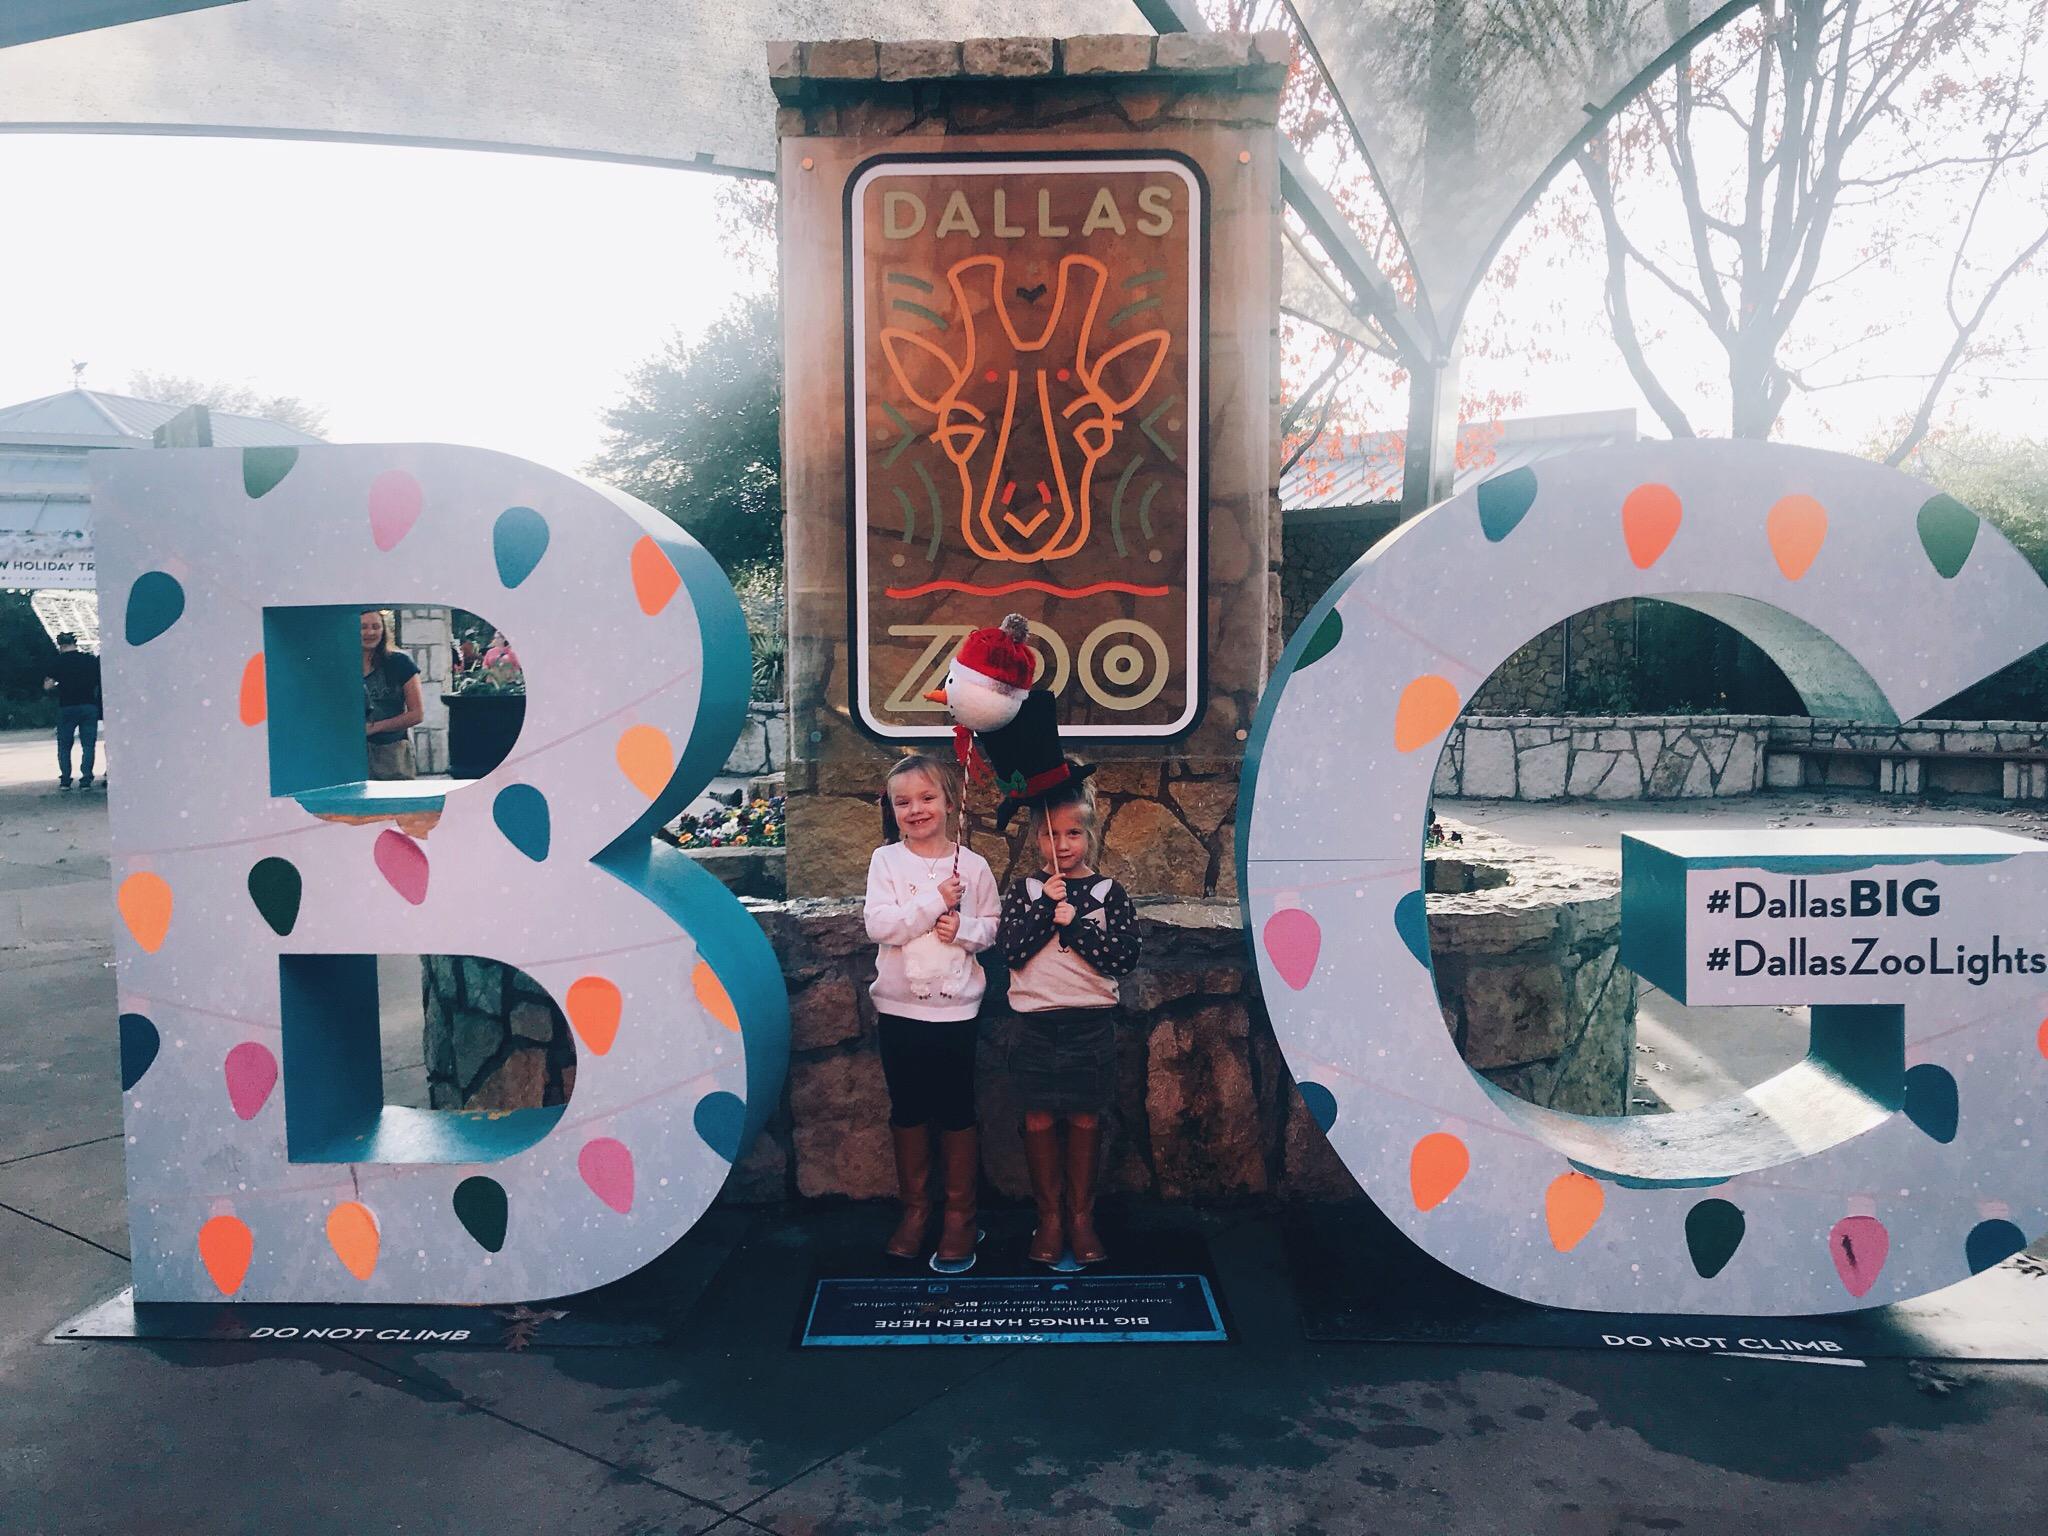 Dallas Zoo Lights 2017